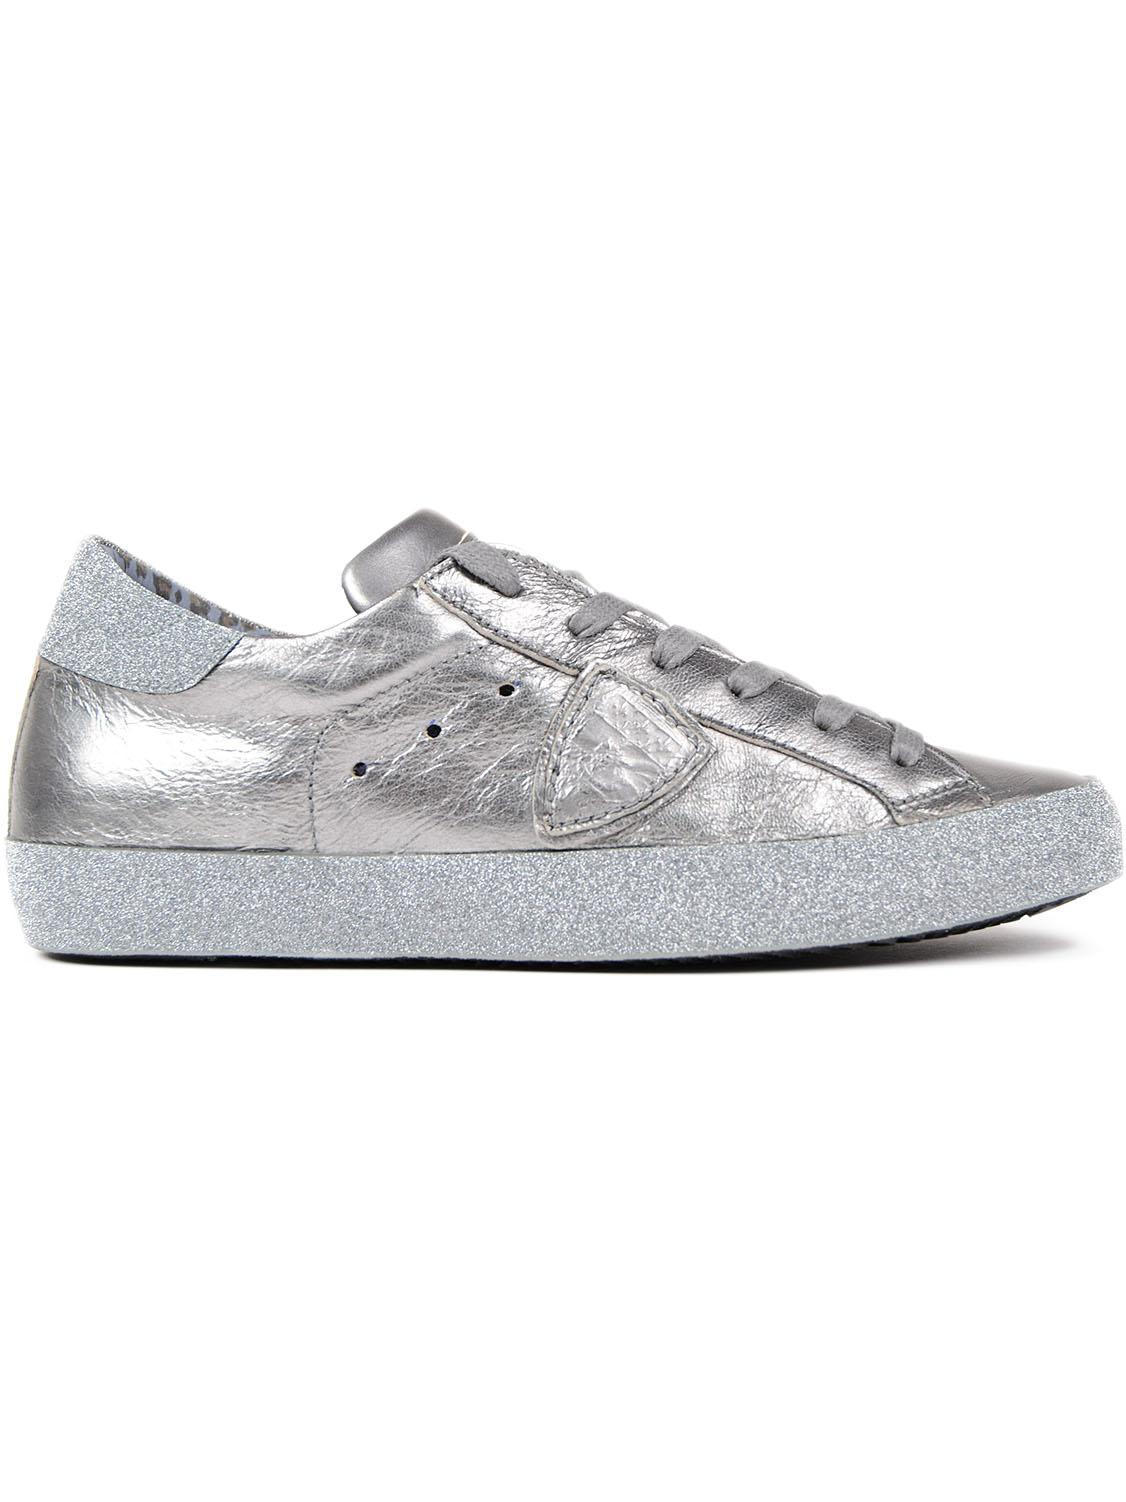 Modèle Philippe Chaussures Glitter Paris - Métalliques SKmg89Bh